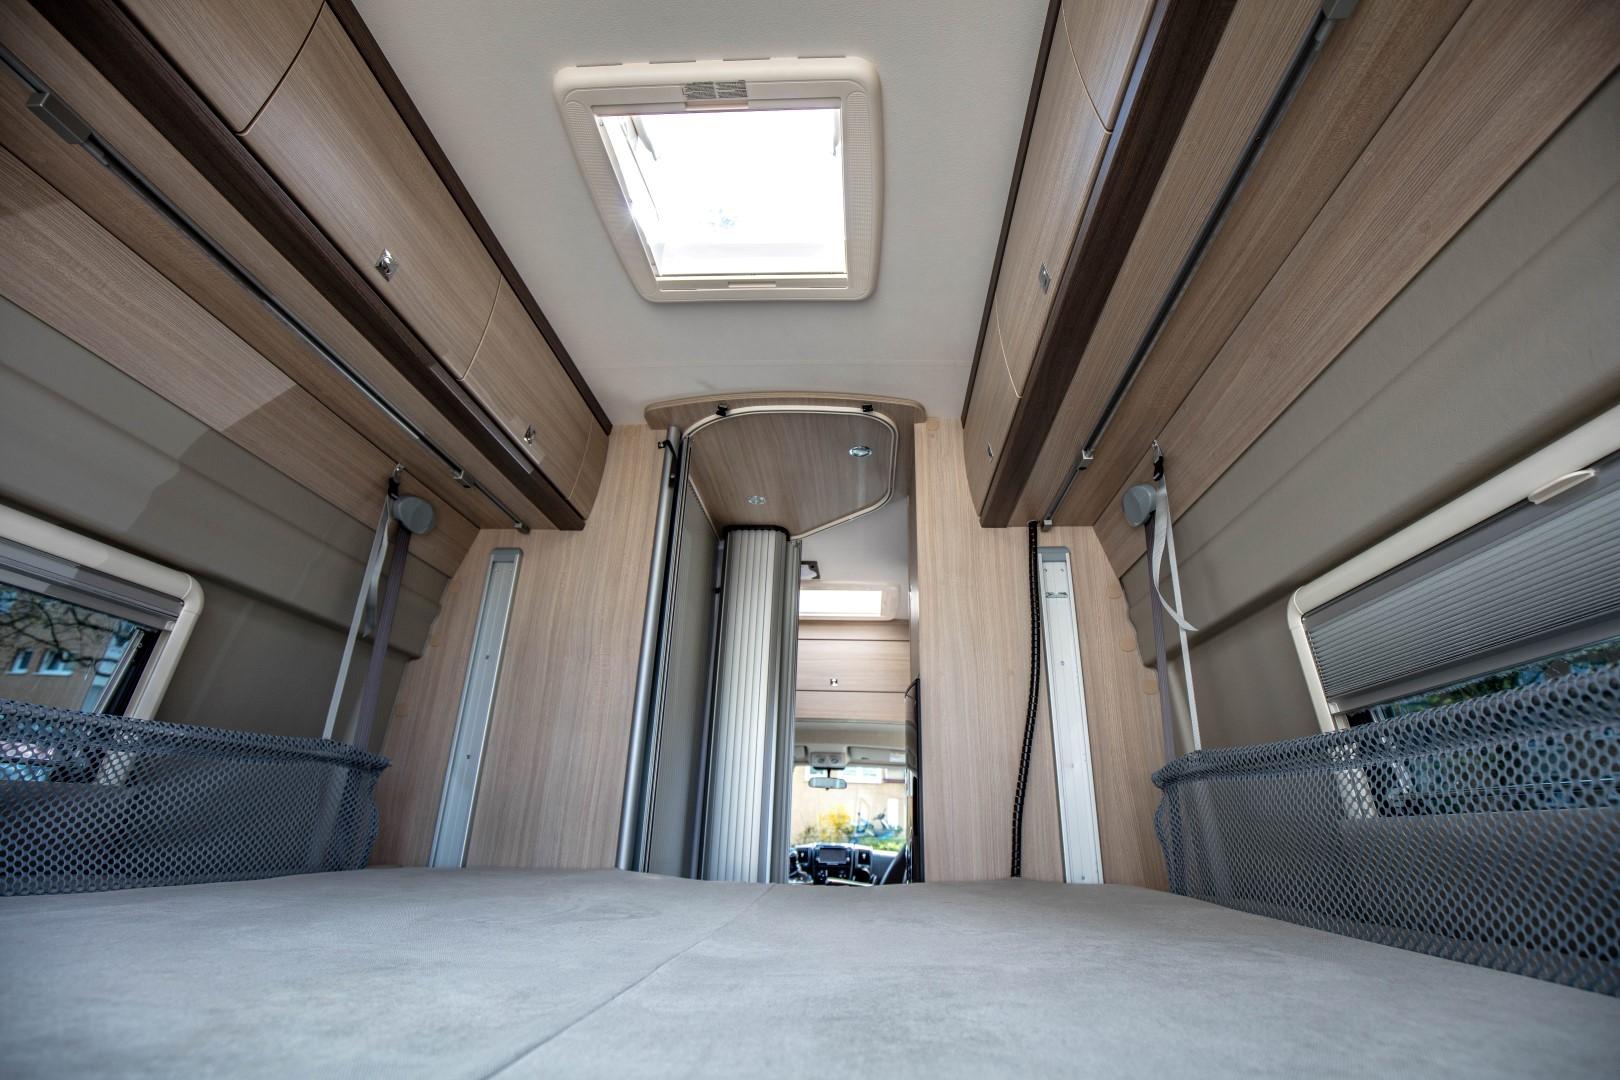 wohnmobil verleih p ssl kastenwagen termin 2017 camper. Black Bedroom Furniture Sets. Home Design Ideas